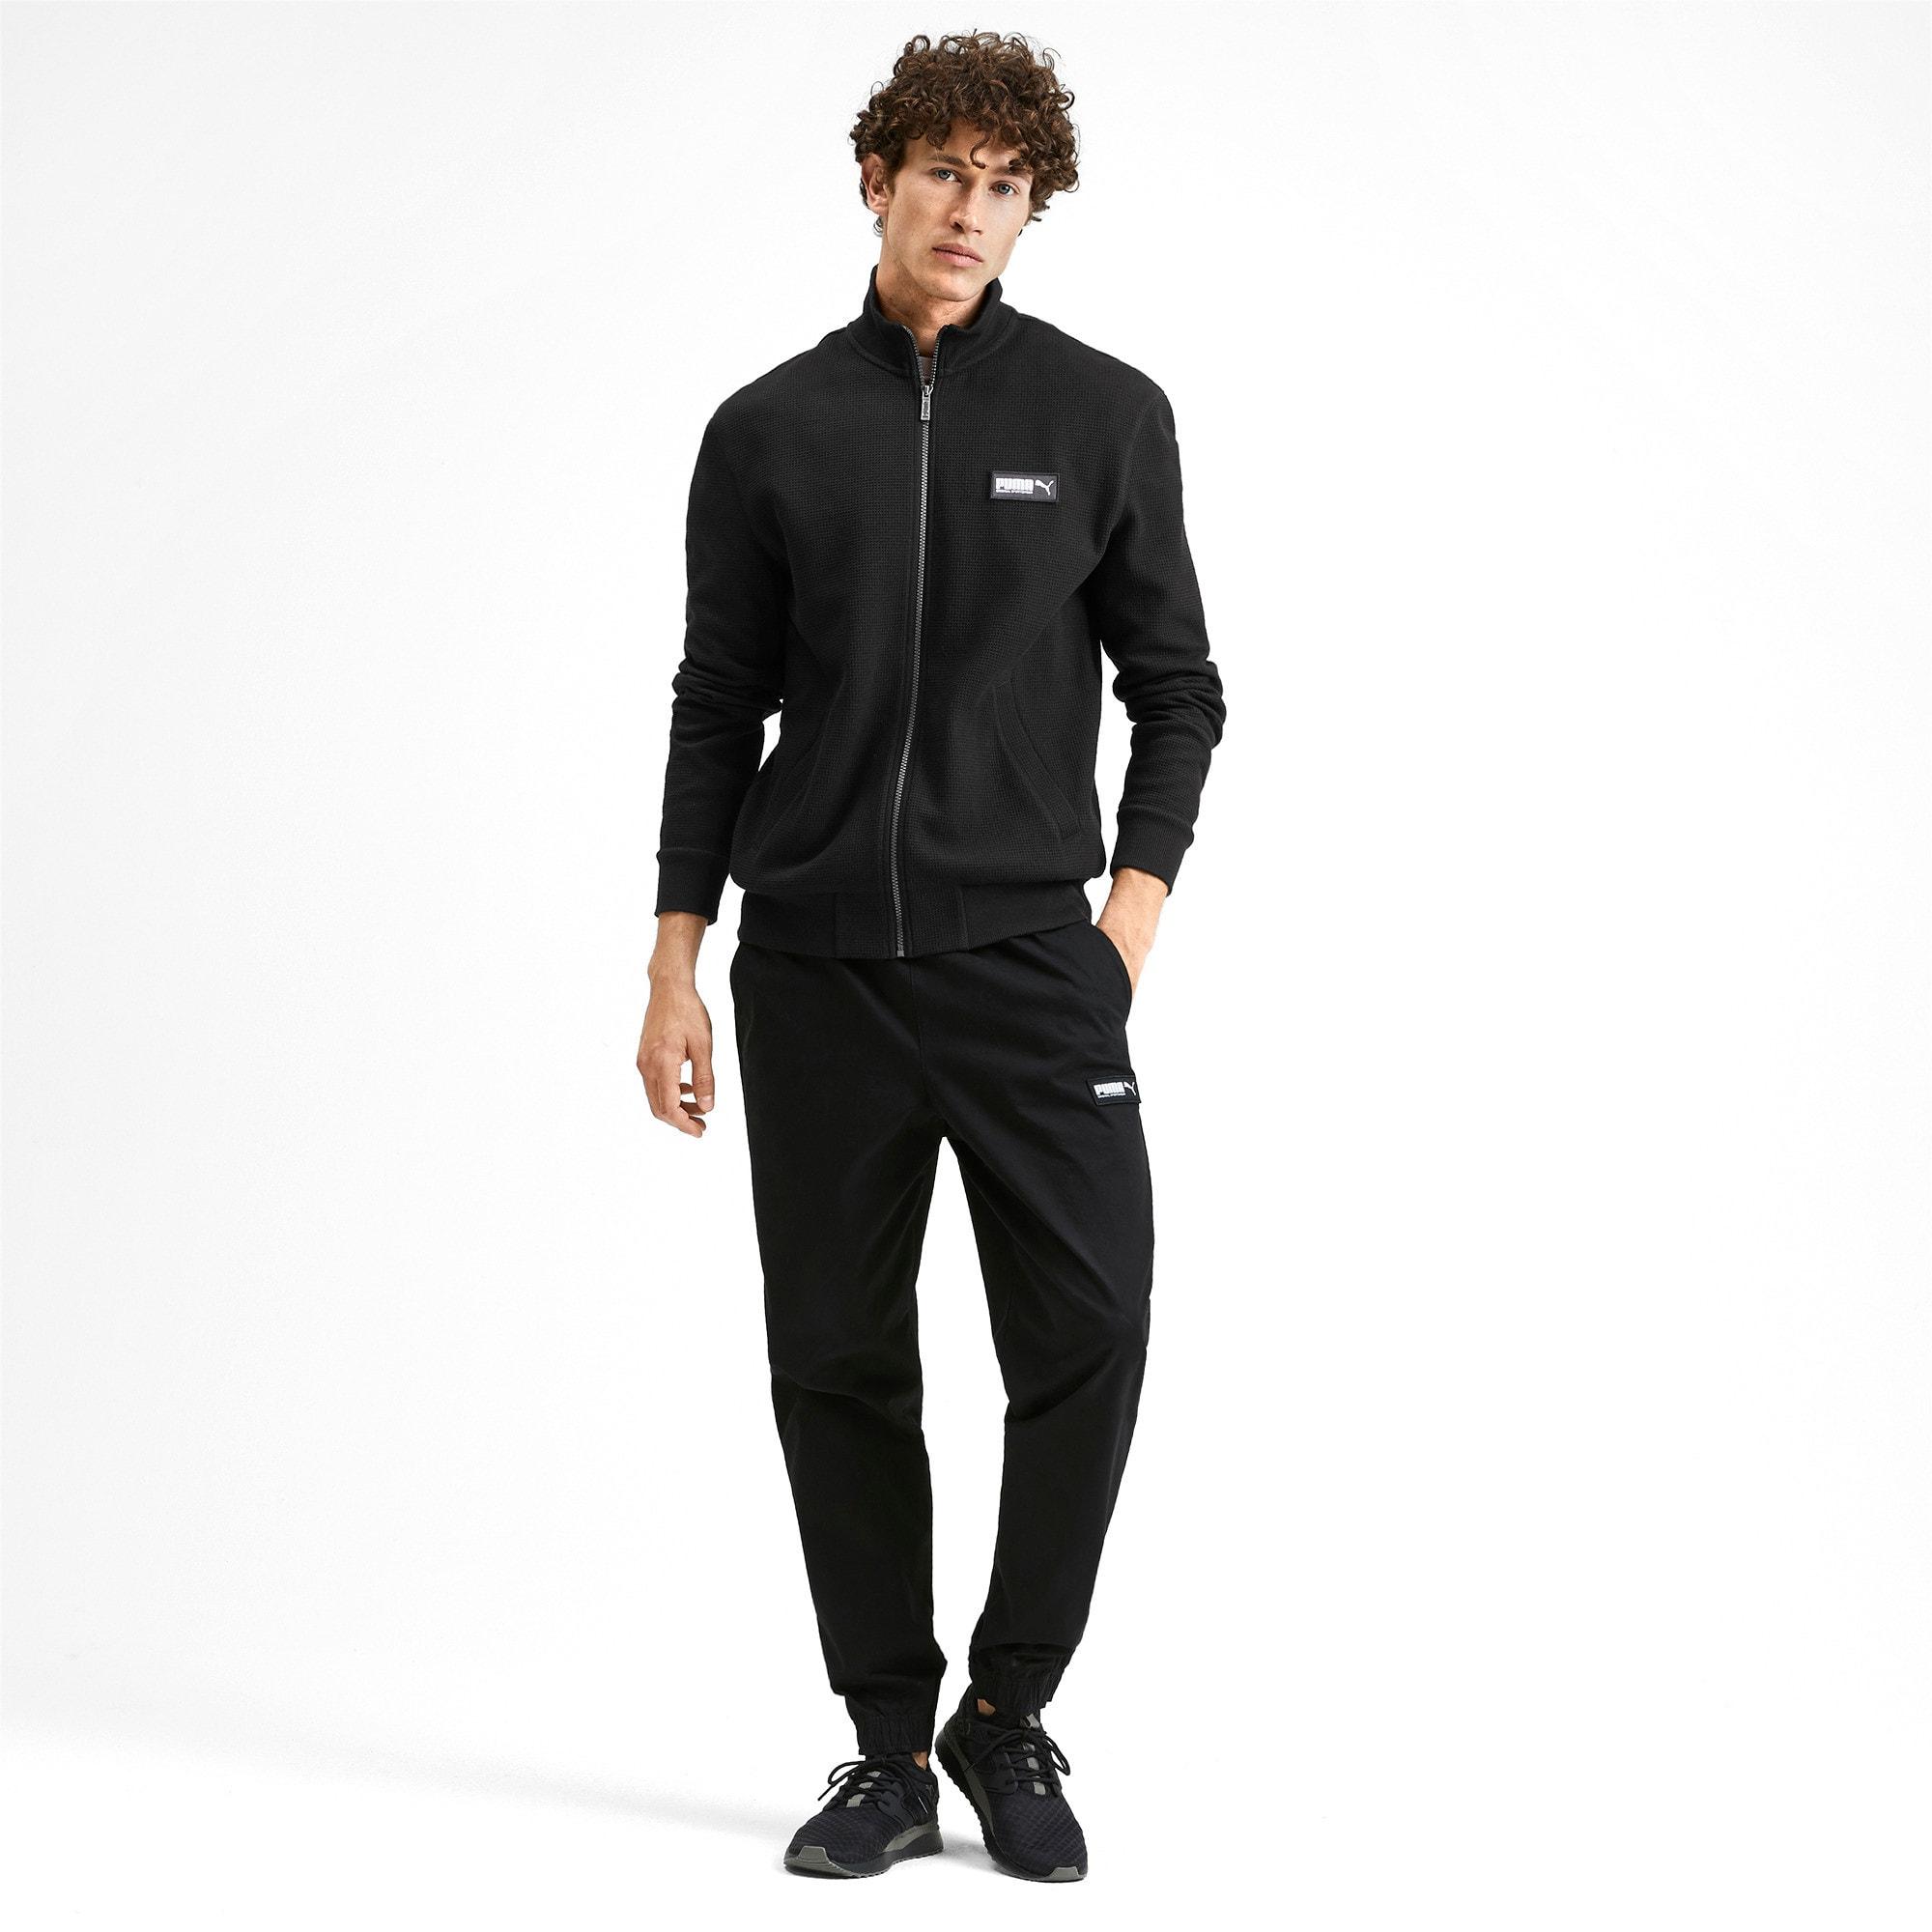 Thumbnail 3 of Fusion Men's Jacket, Puma Black, medium